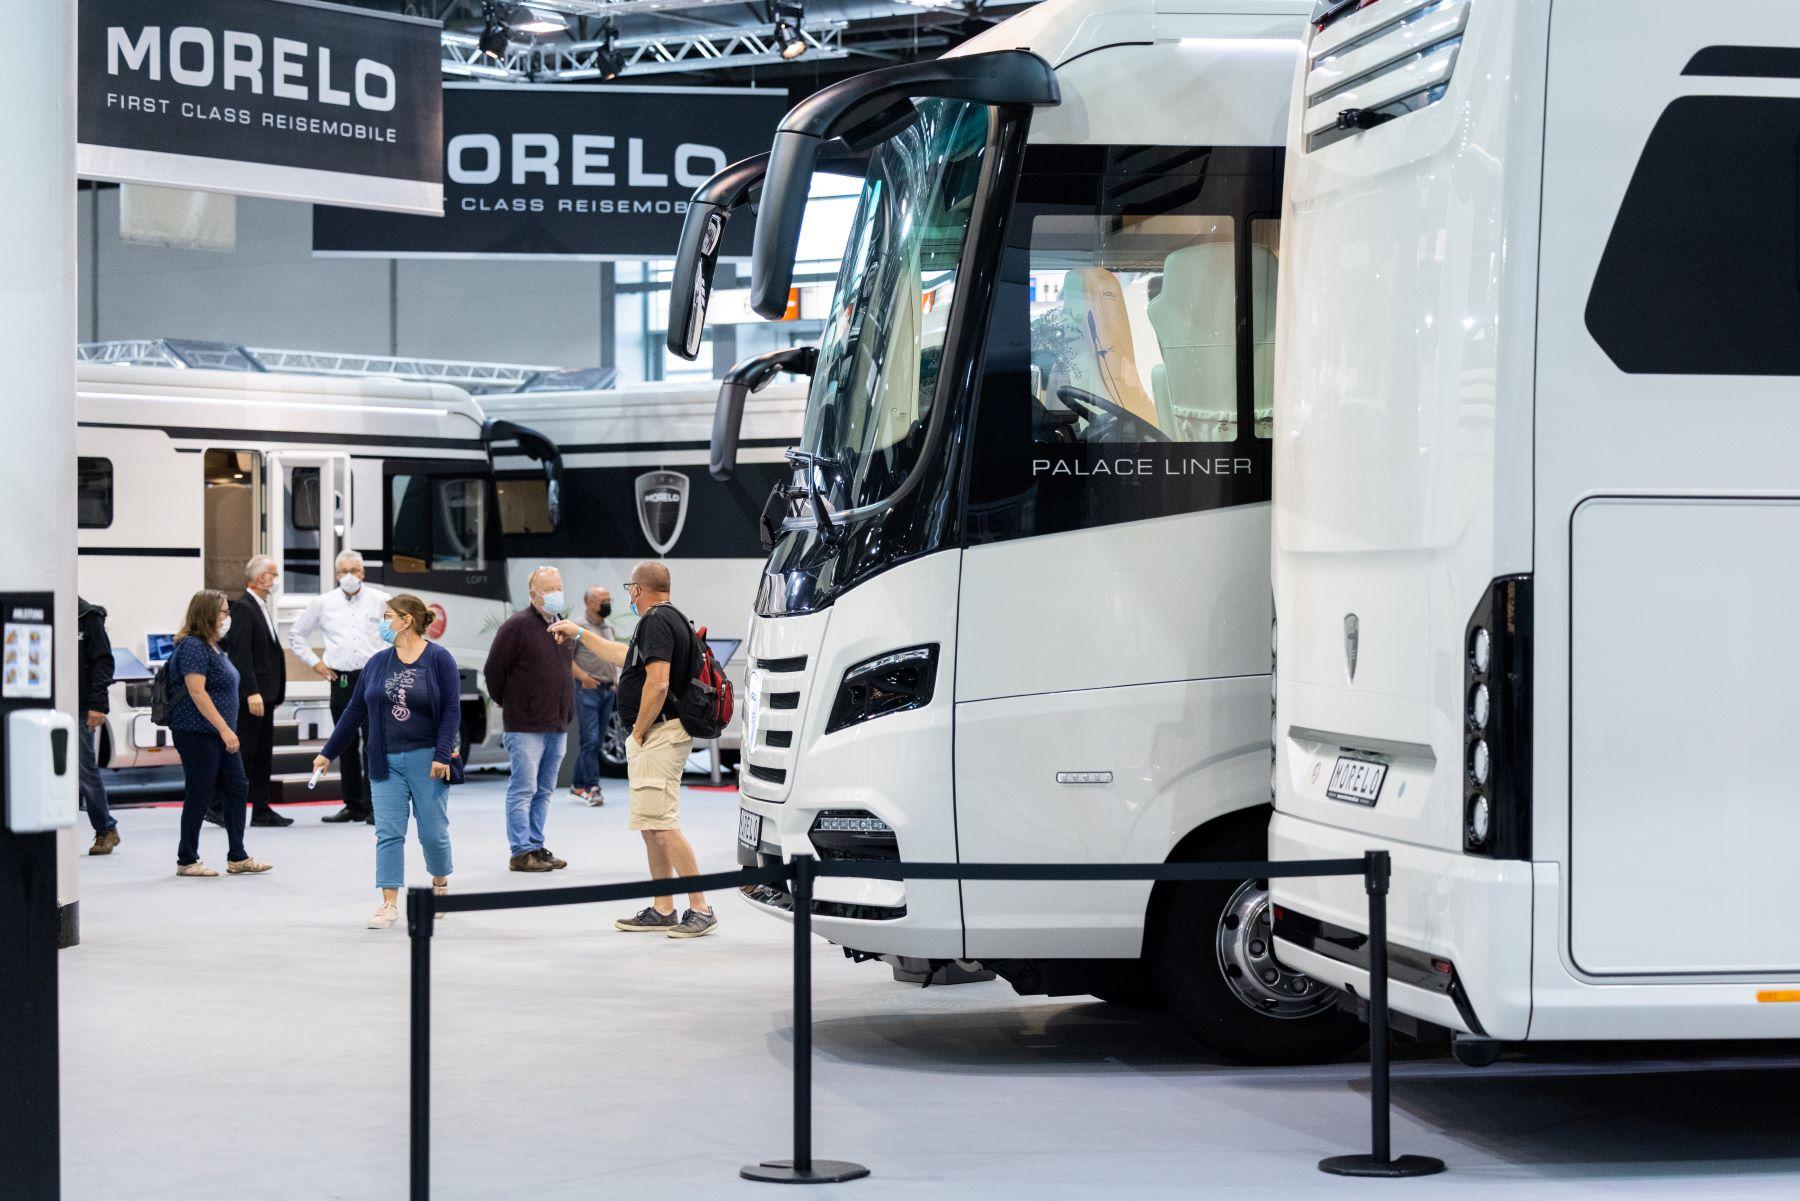 A trade fair of caravans, motorhomes, and RVs at the 60th Caravan Salon